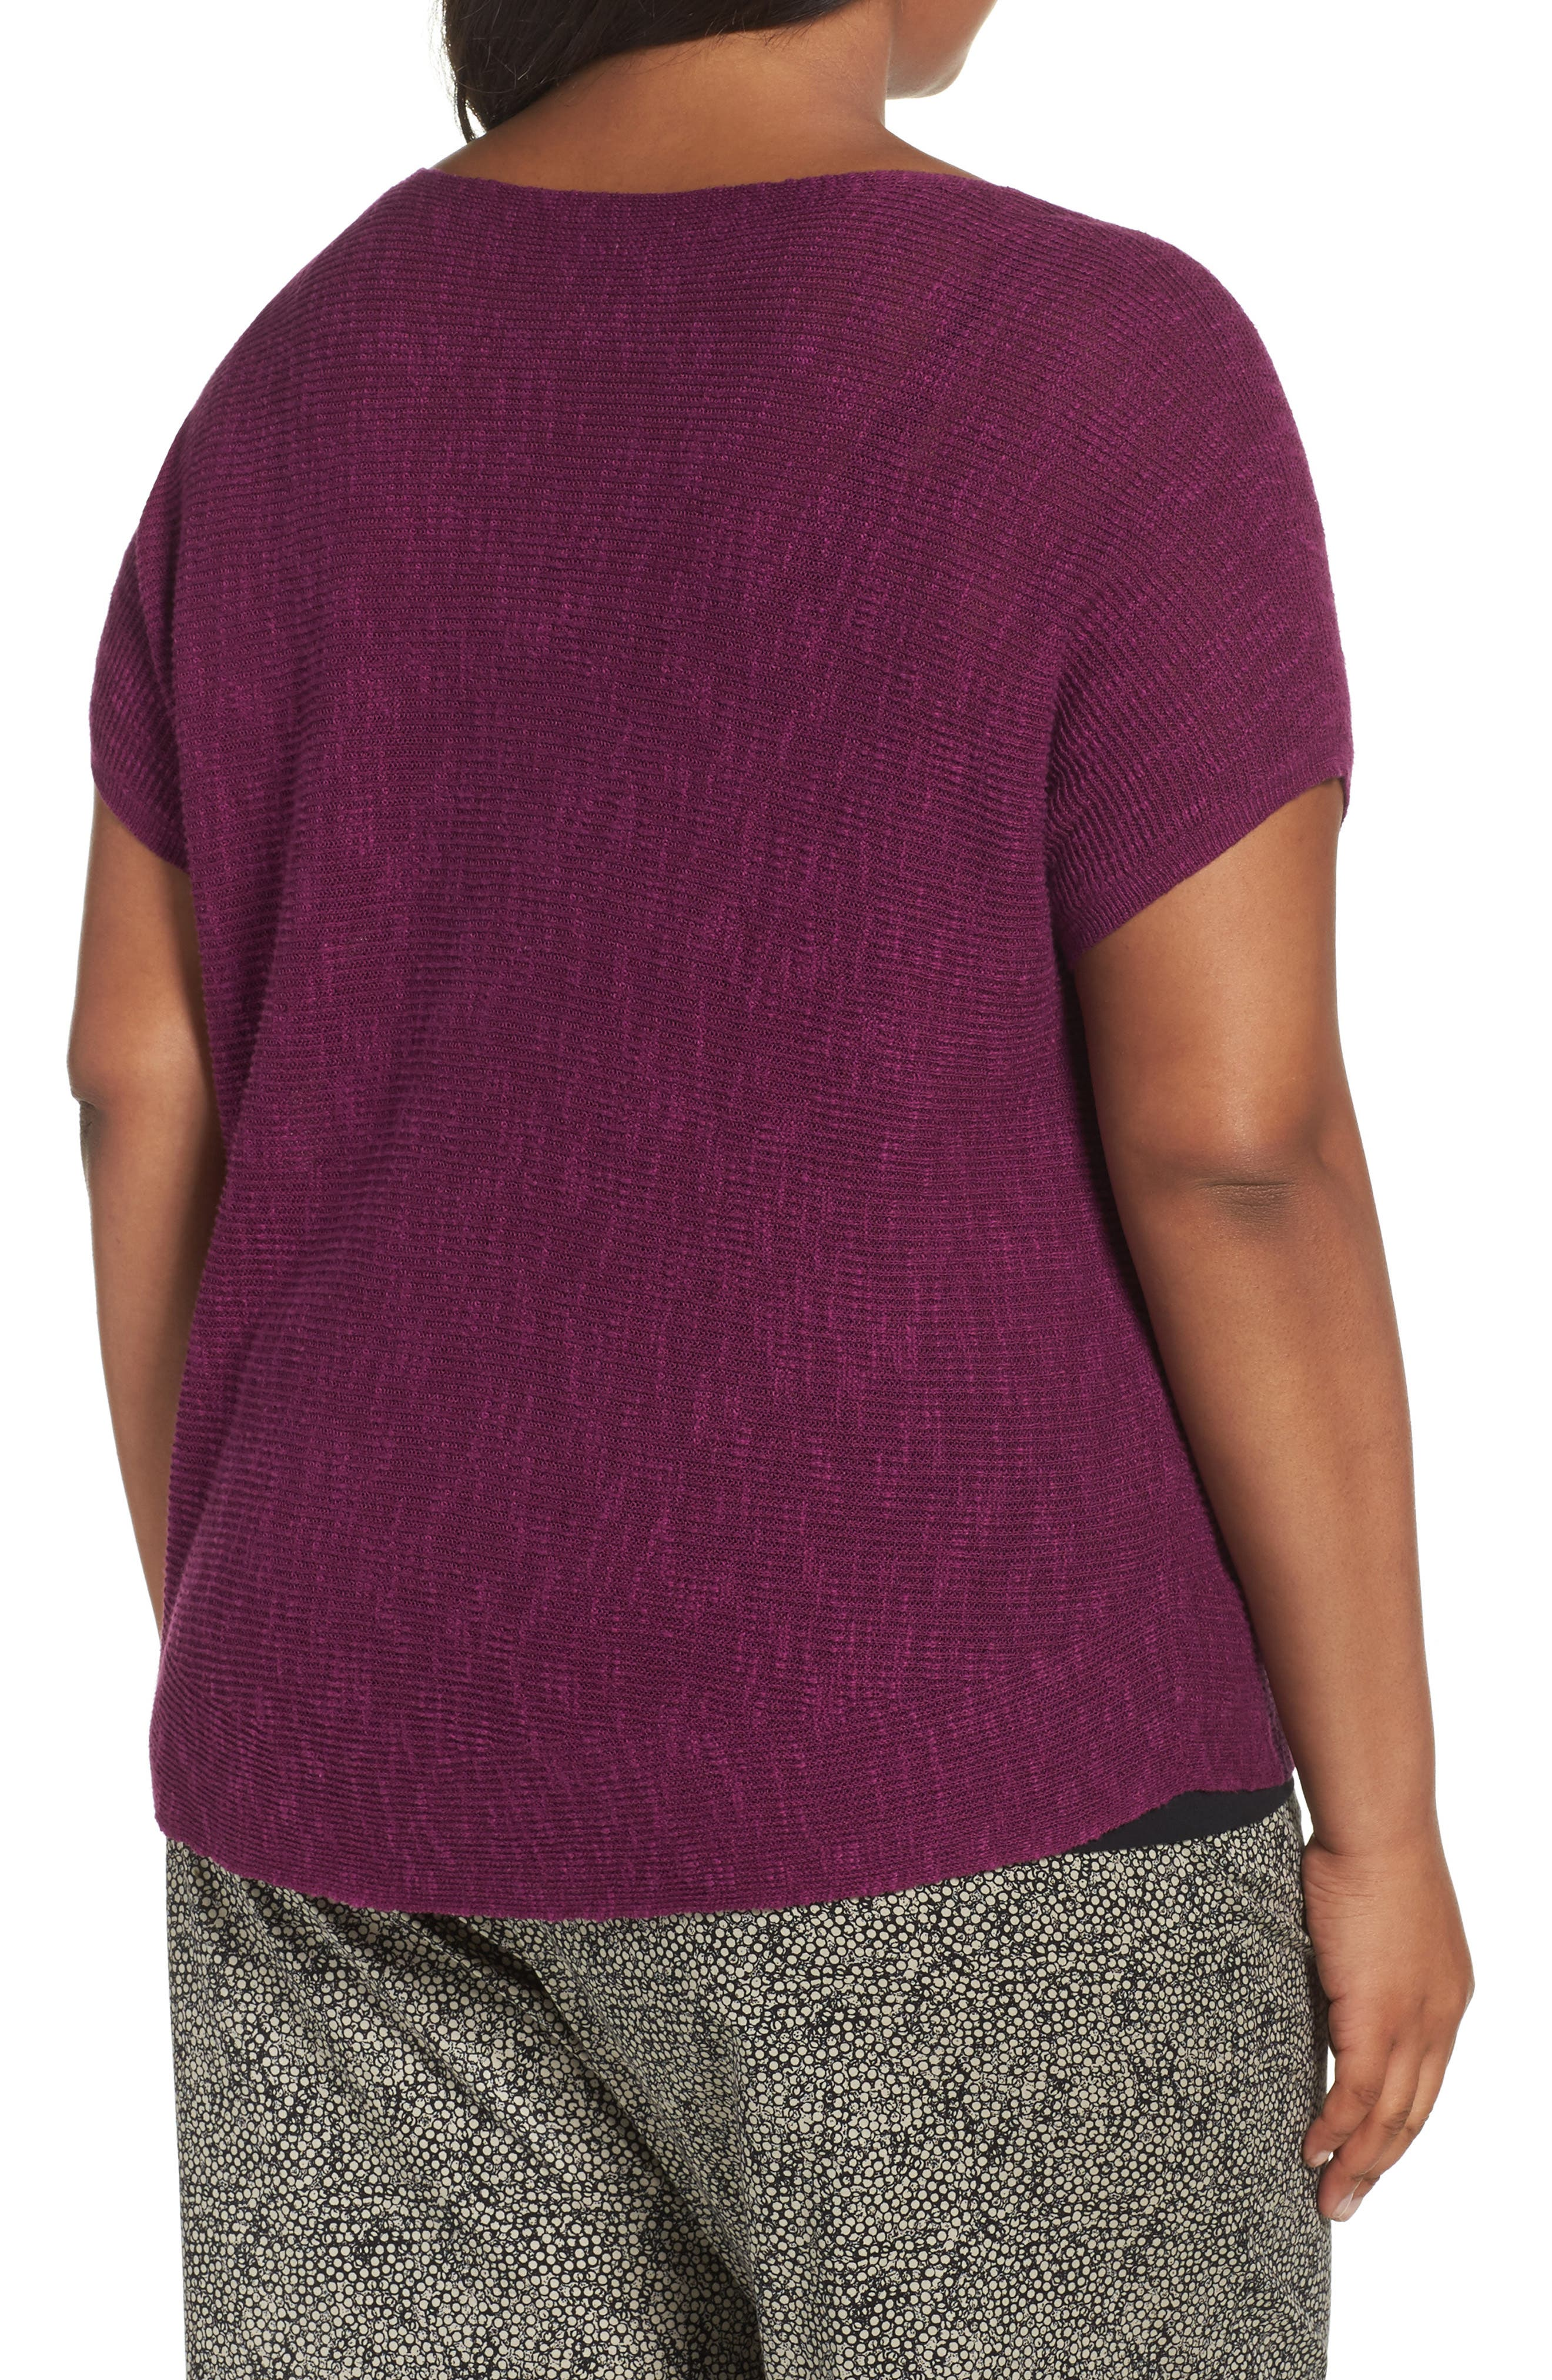 Alternate Image 2  - Eileen Fisher Organic Linen & Cotton Rib Sweater (Plus Size)